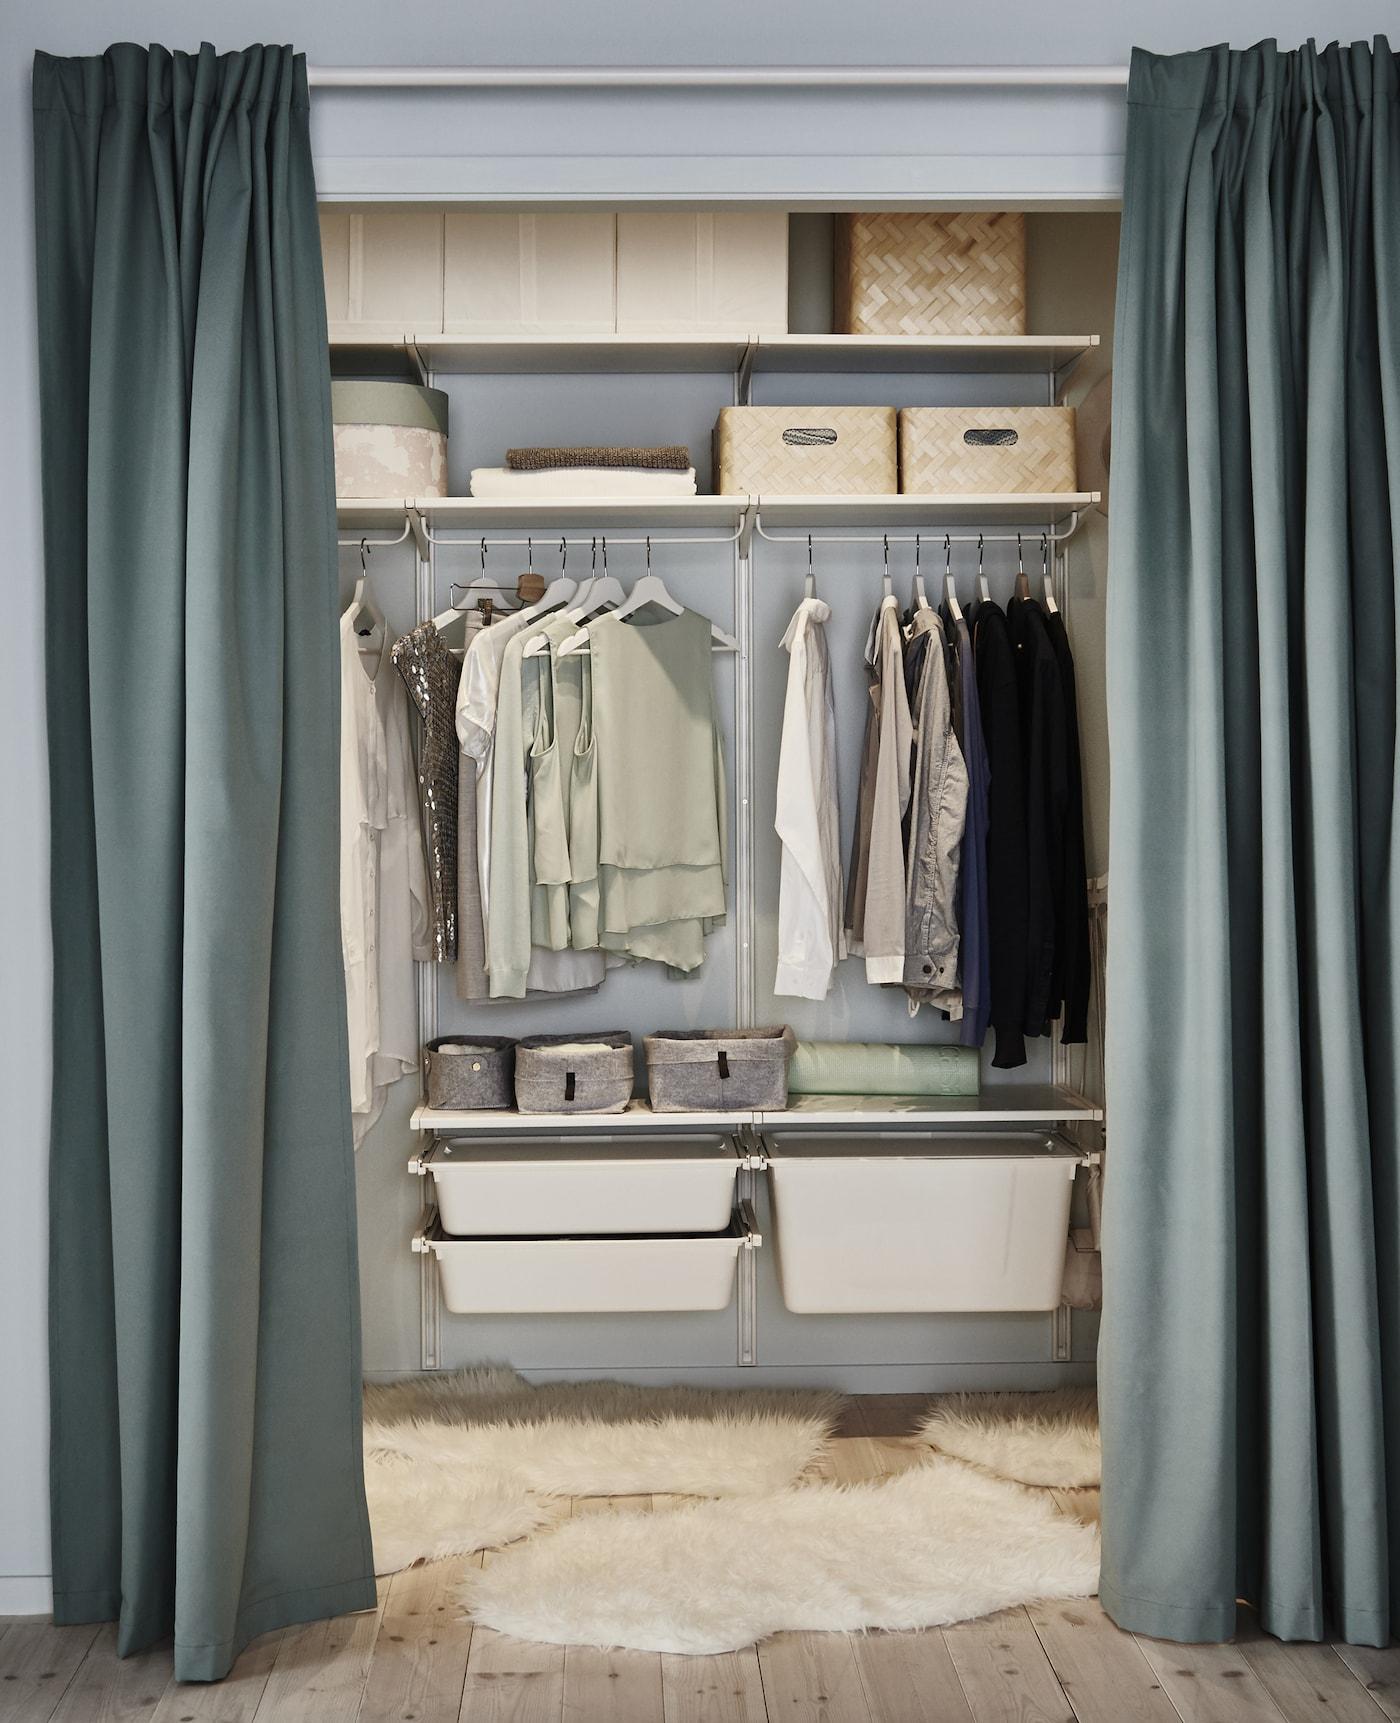 Ikea Begehbaren Kleiderschrank Ikea Begehbaren Kleiderschrank ...